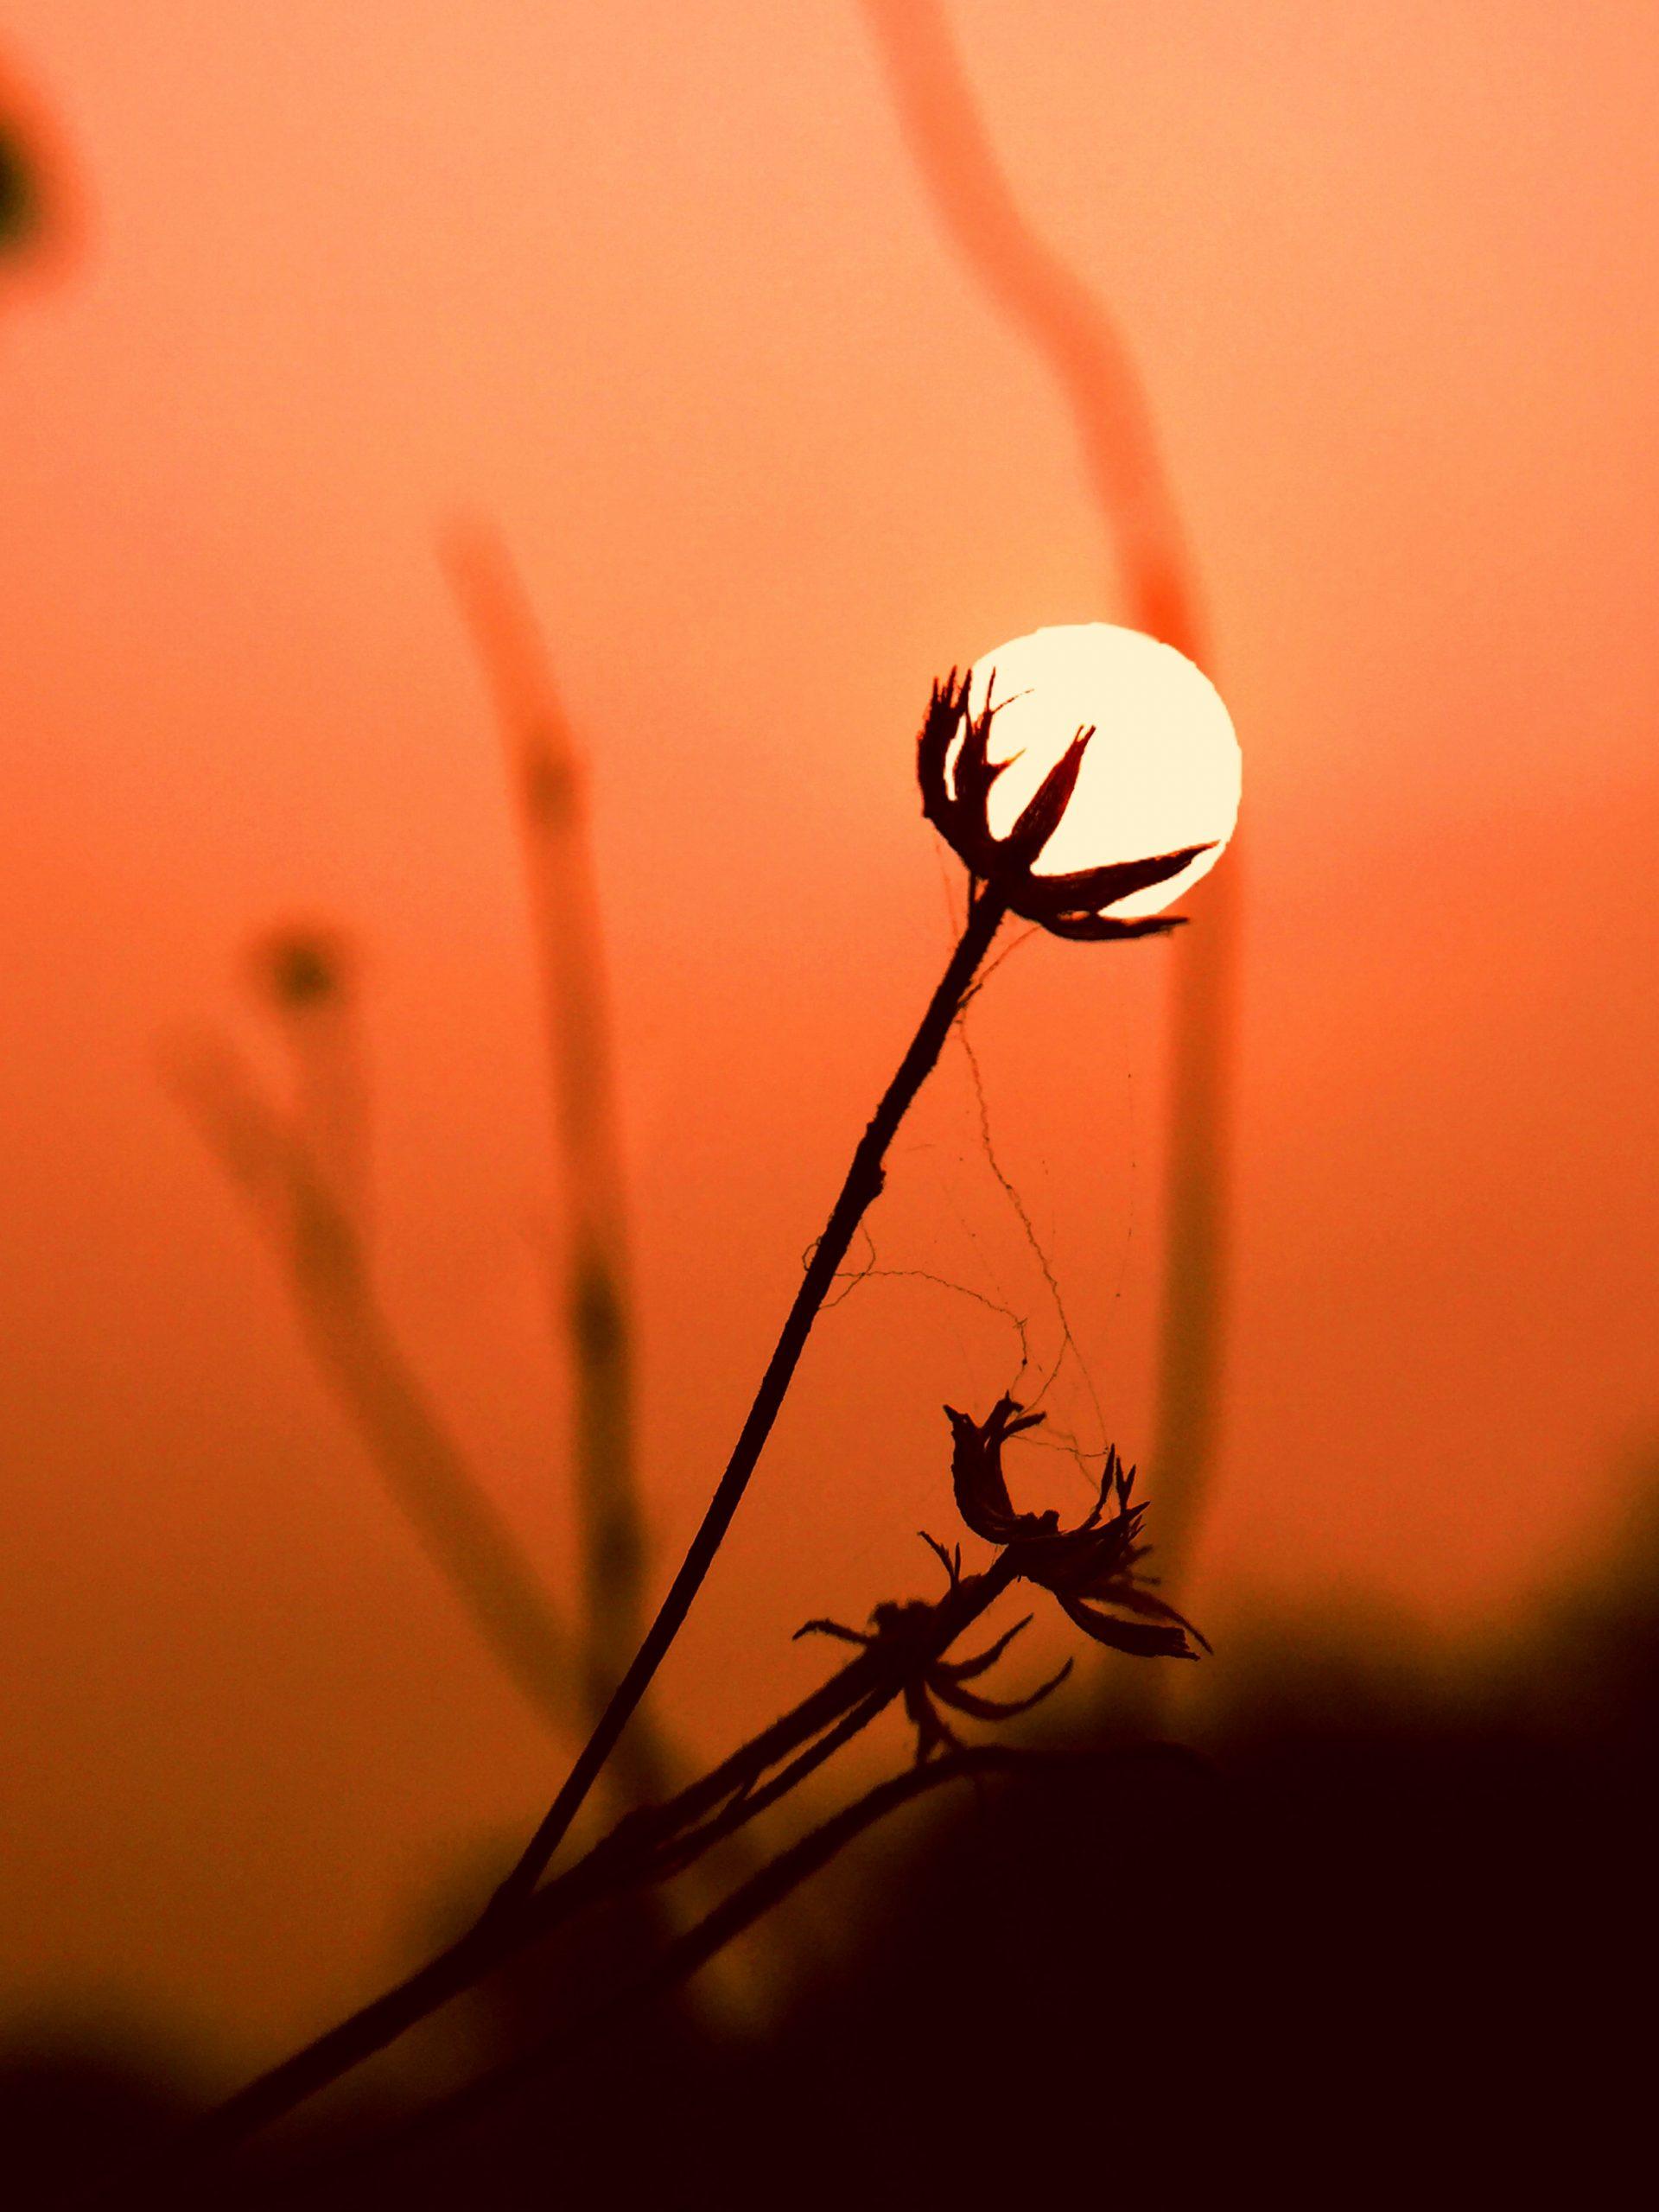 Sun on plant